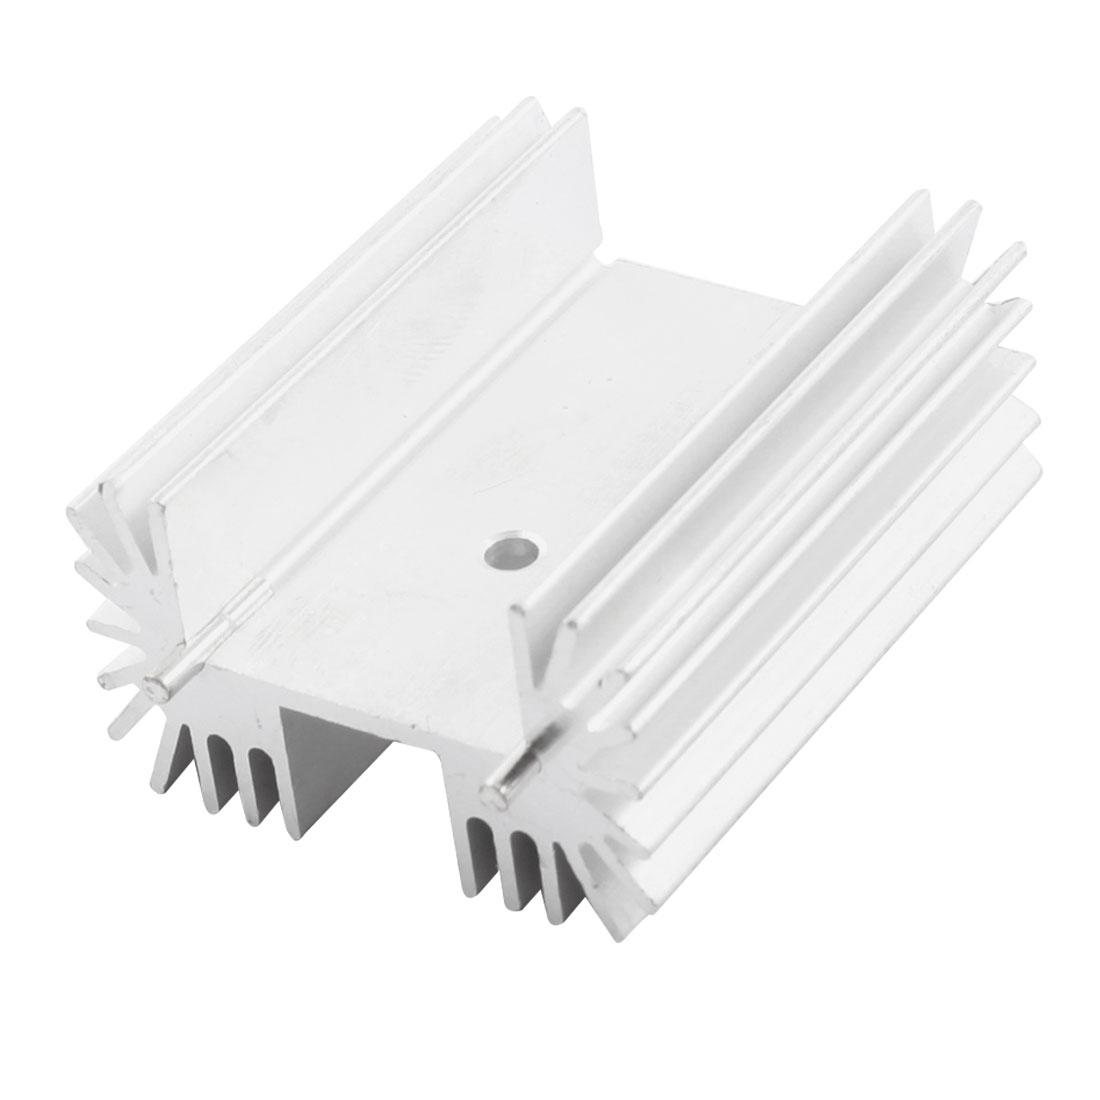 PCB Board Silver Tone Aluminium Heatsink Heat Diffuse Cooler 50mm x 42mm x 25mm w Dual Needle